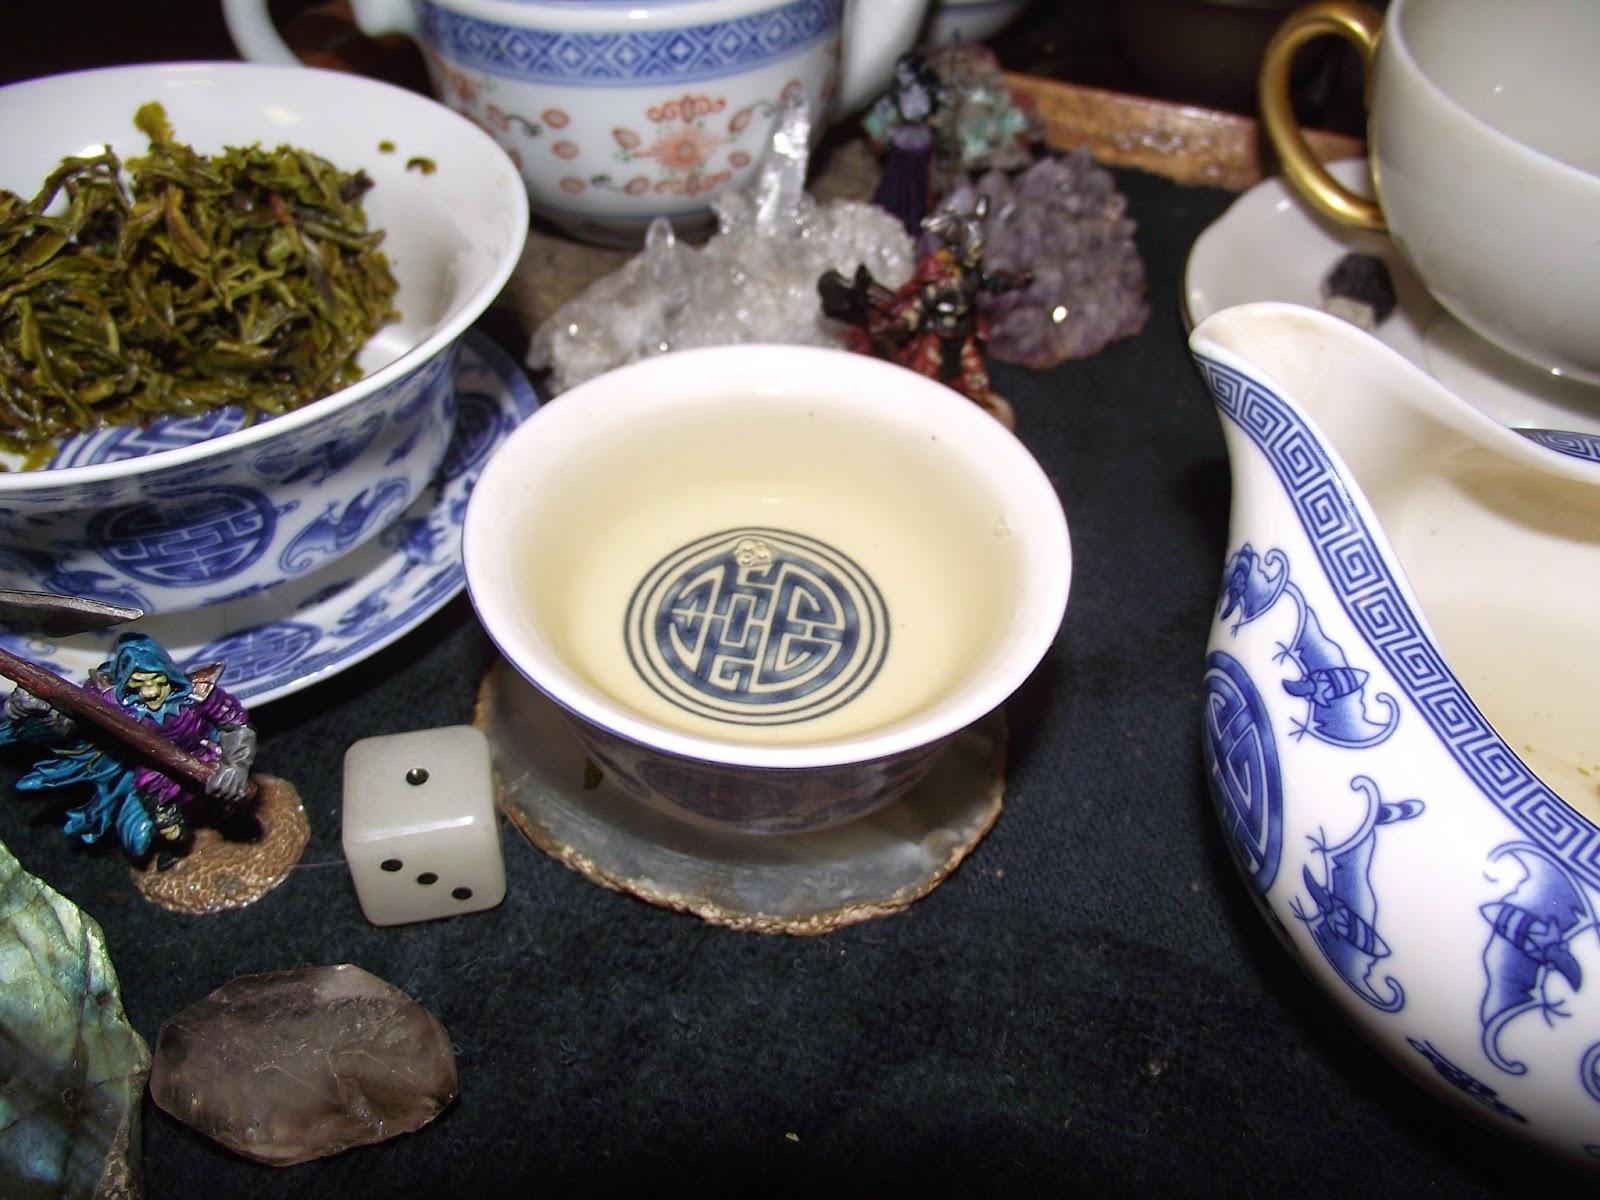 billimalai nilgiri white tea